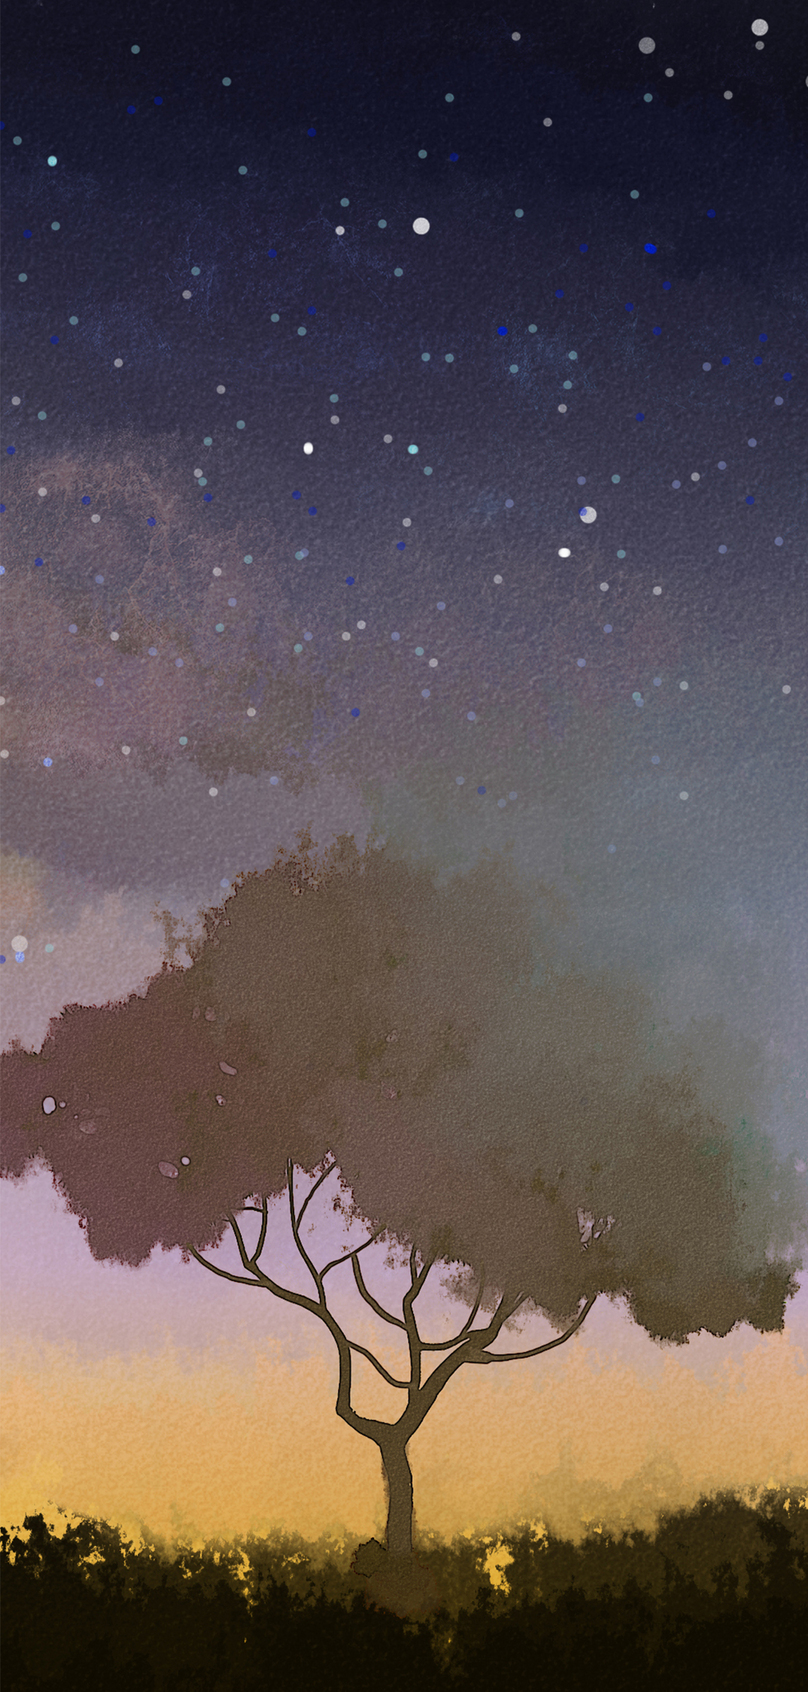 Kertas Dinding Pokok Kertas Bintang Gambar Unduh Gratis Imej